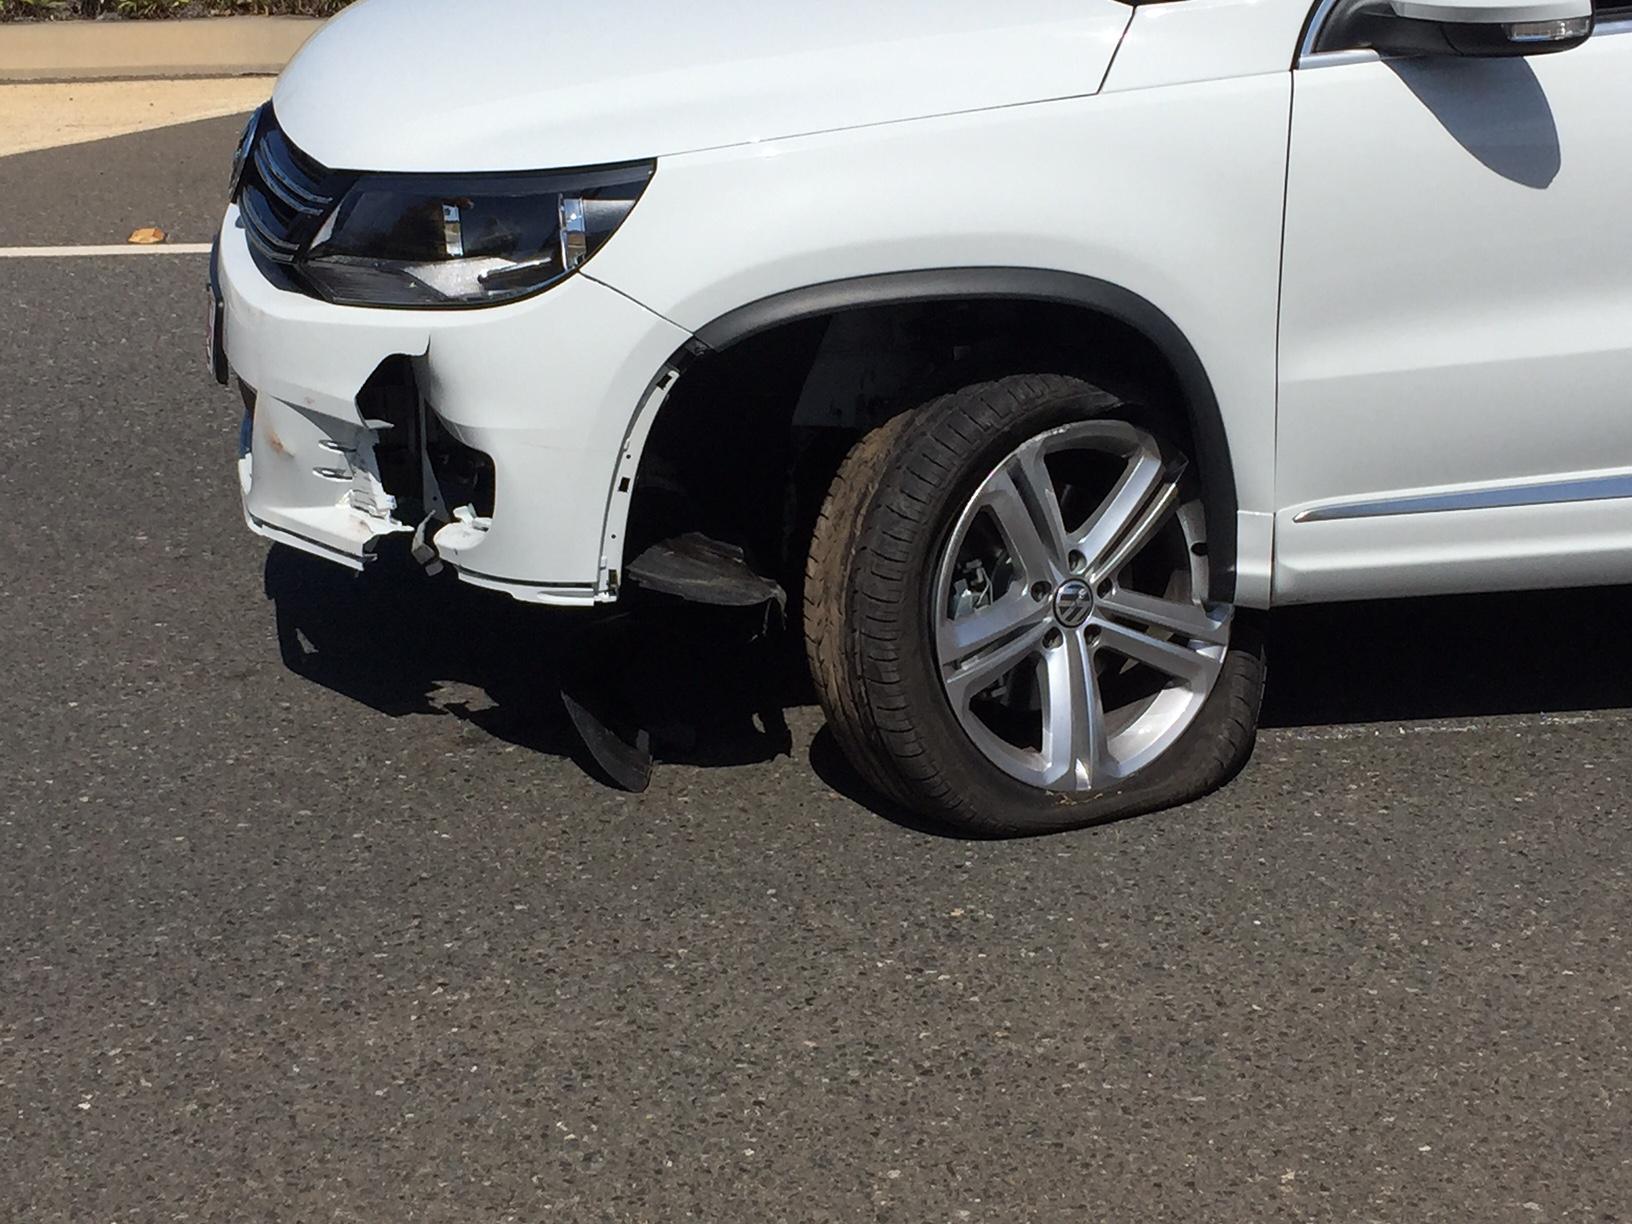 Damage to the vehicle.